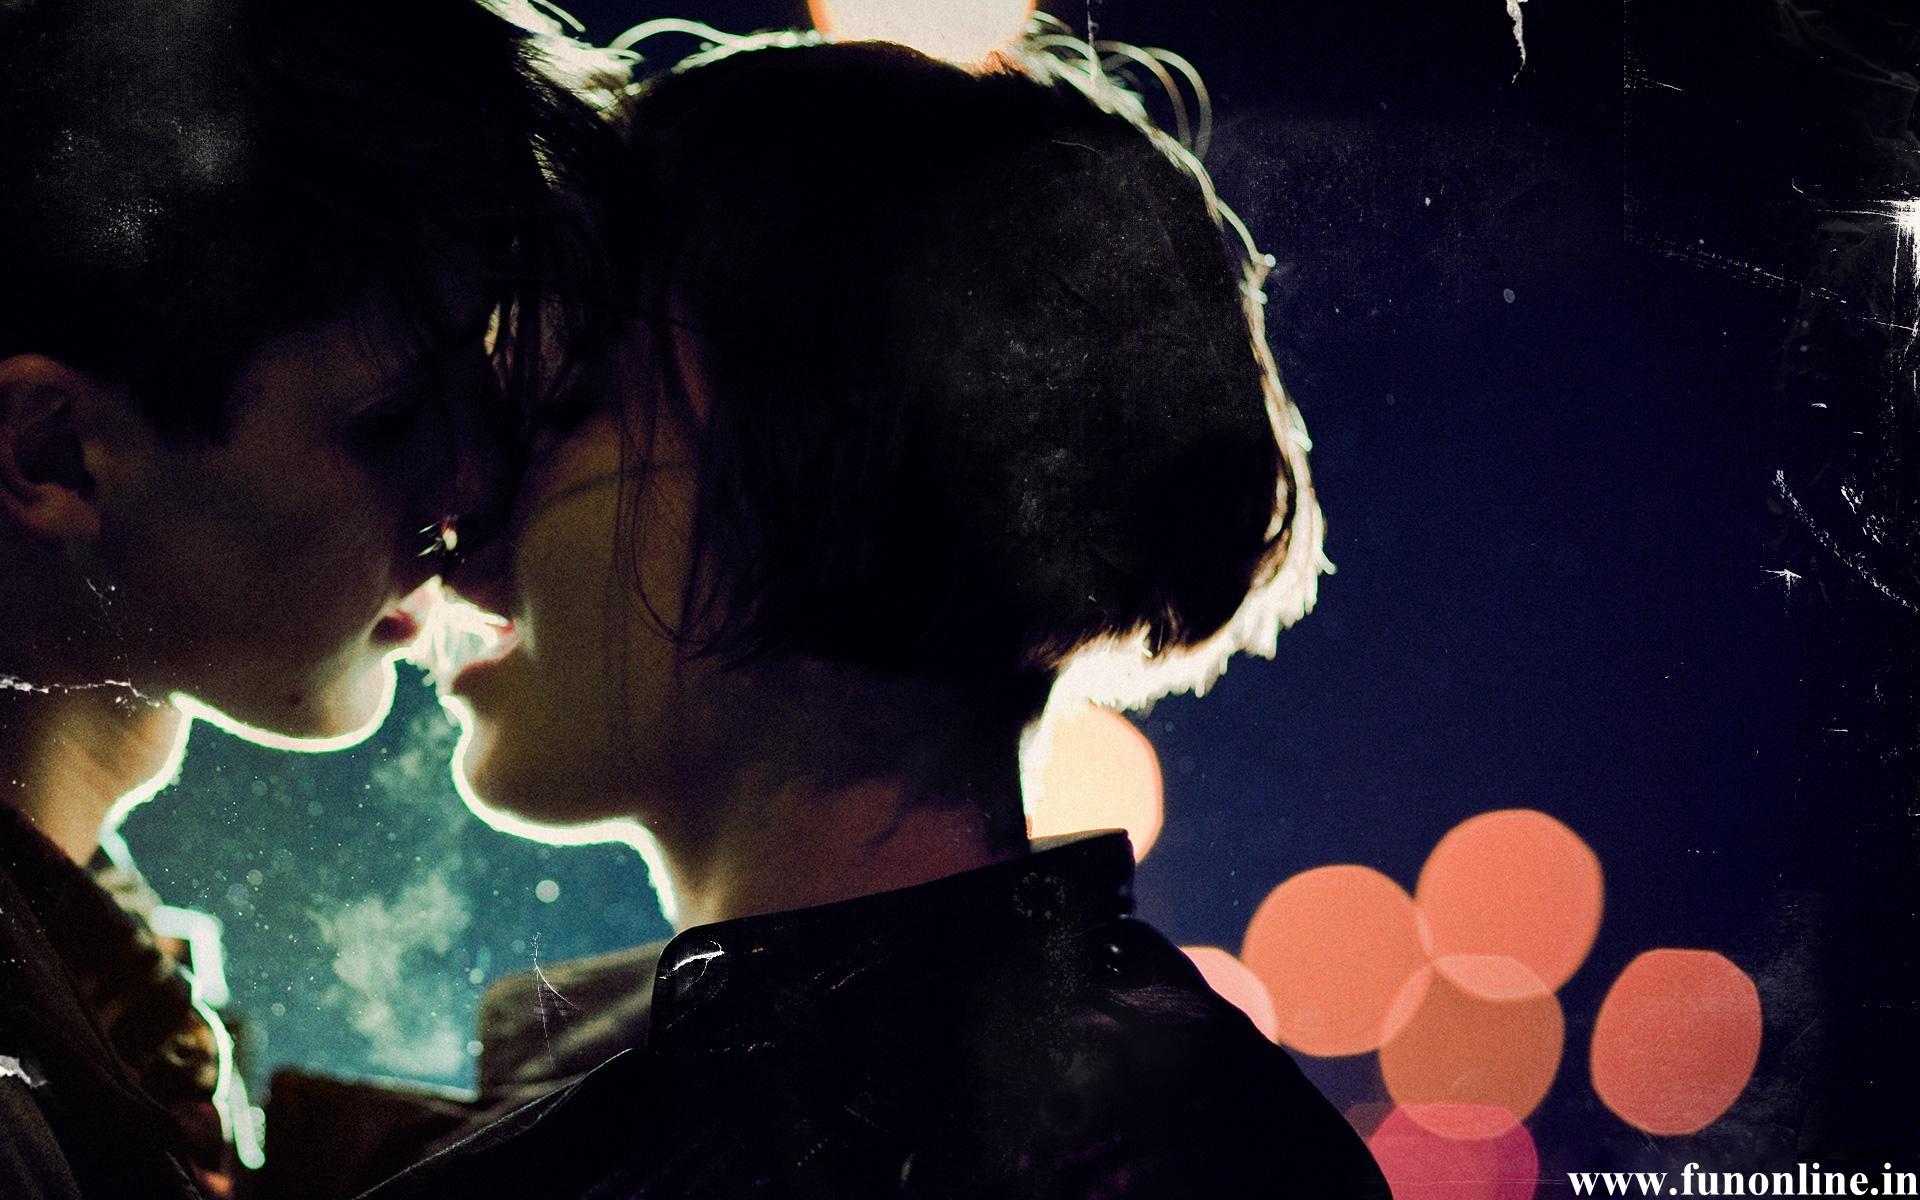 76+] Kiss Love Wallpaper on WallpaperSafari